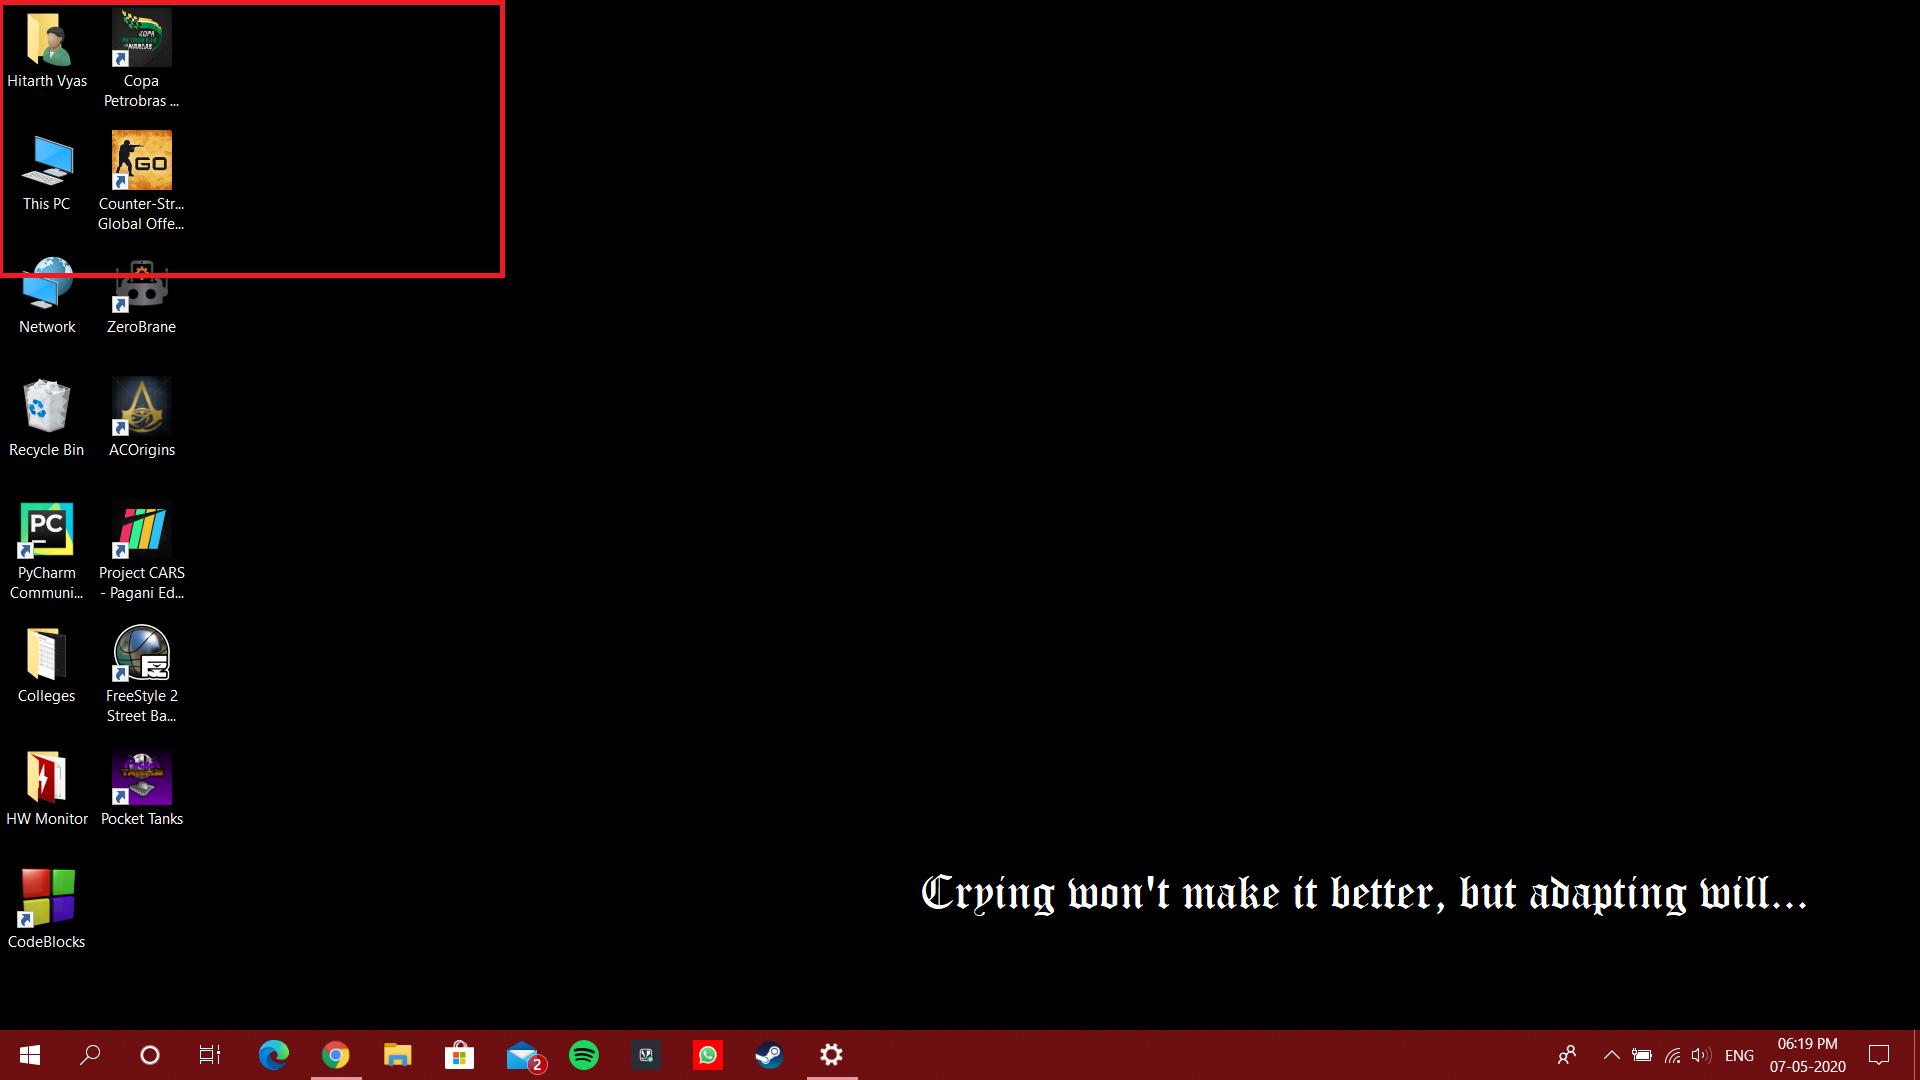 Mouse irresponsive on top left corner of the screen 1080c1e8-67b9-48e6-b78c-83cb17b611e3?upload=true.png